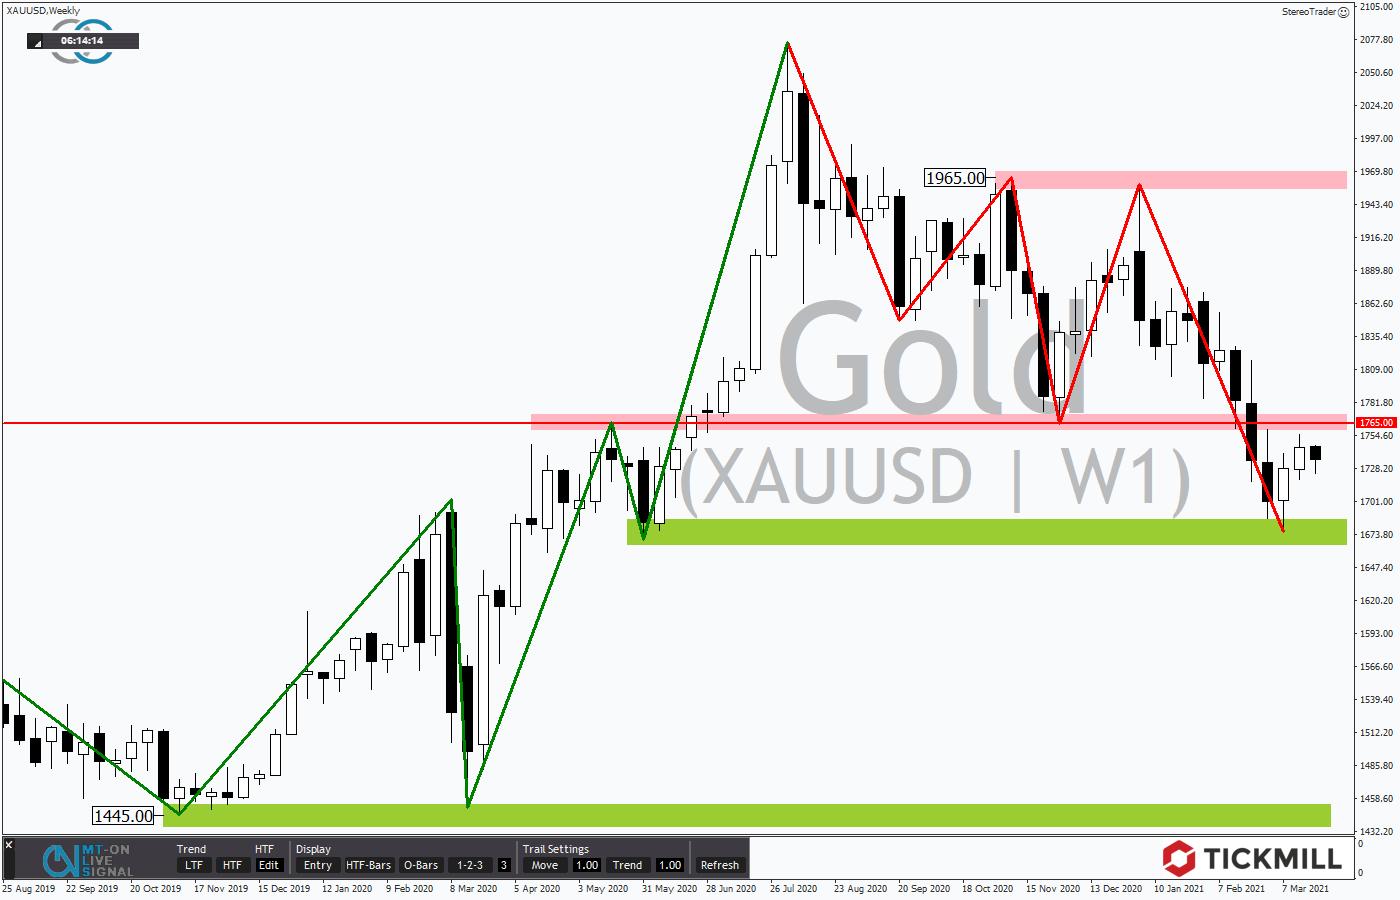 Tickmill-Analyse: Wochenchart im GOLD